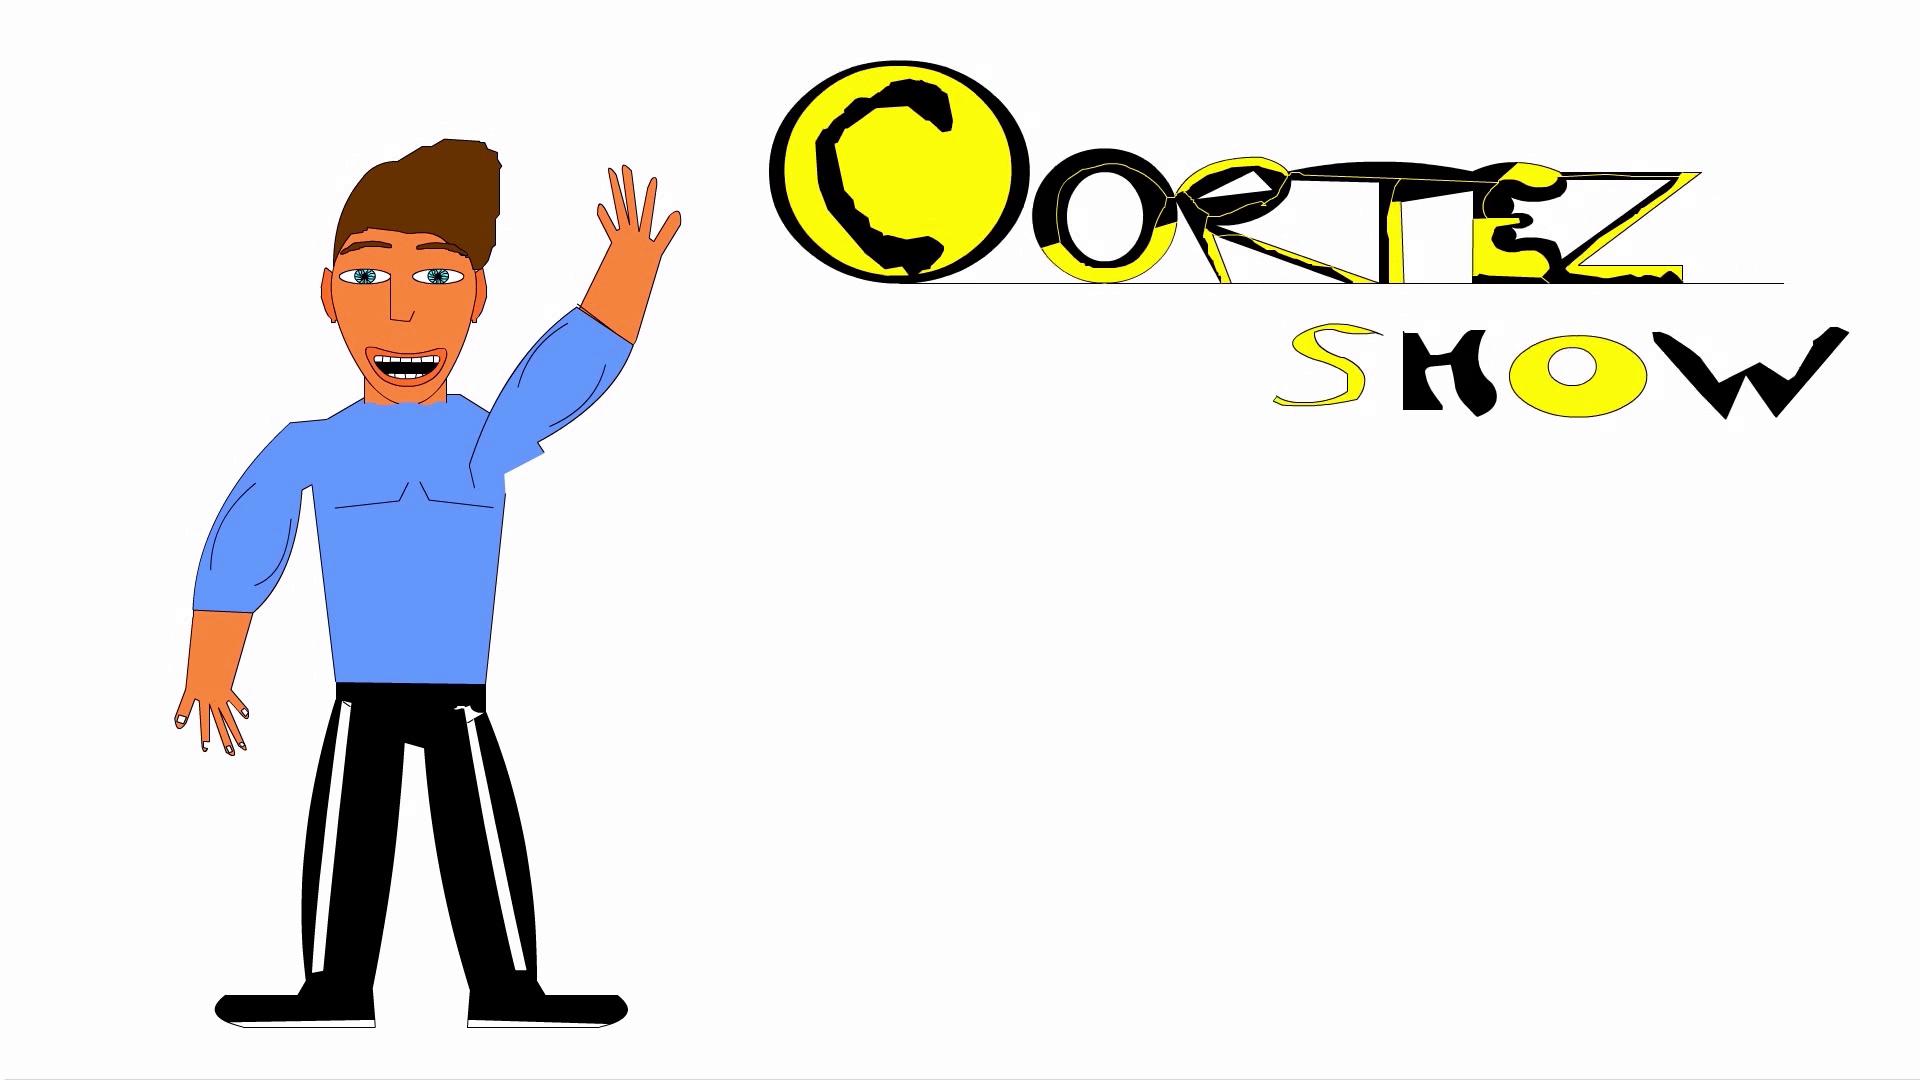 Cortez Show - Season 1